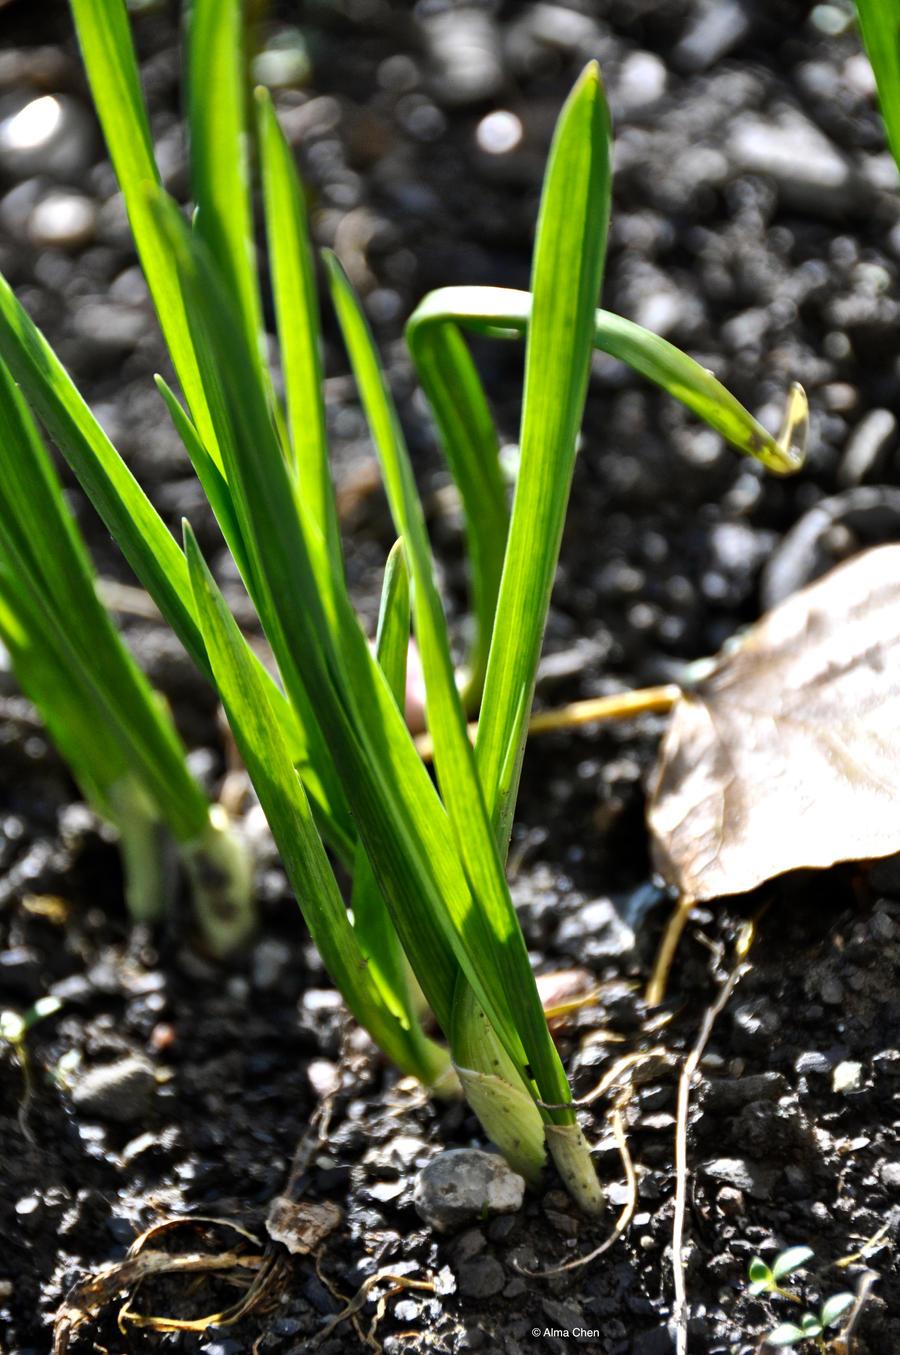 Green Garlic Leaves wallpaper > Green Garlic Leaves Papel de parede > Green Garlic Leaves Fondos